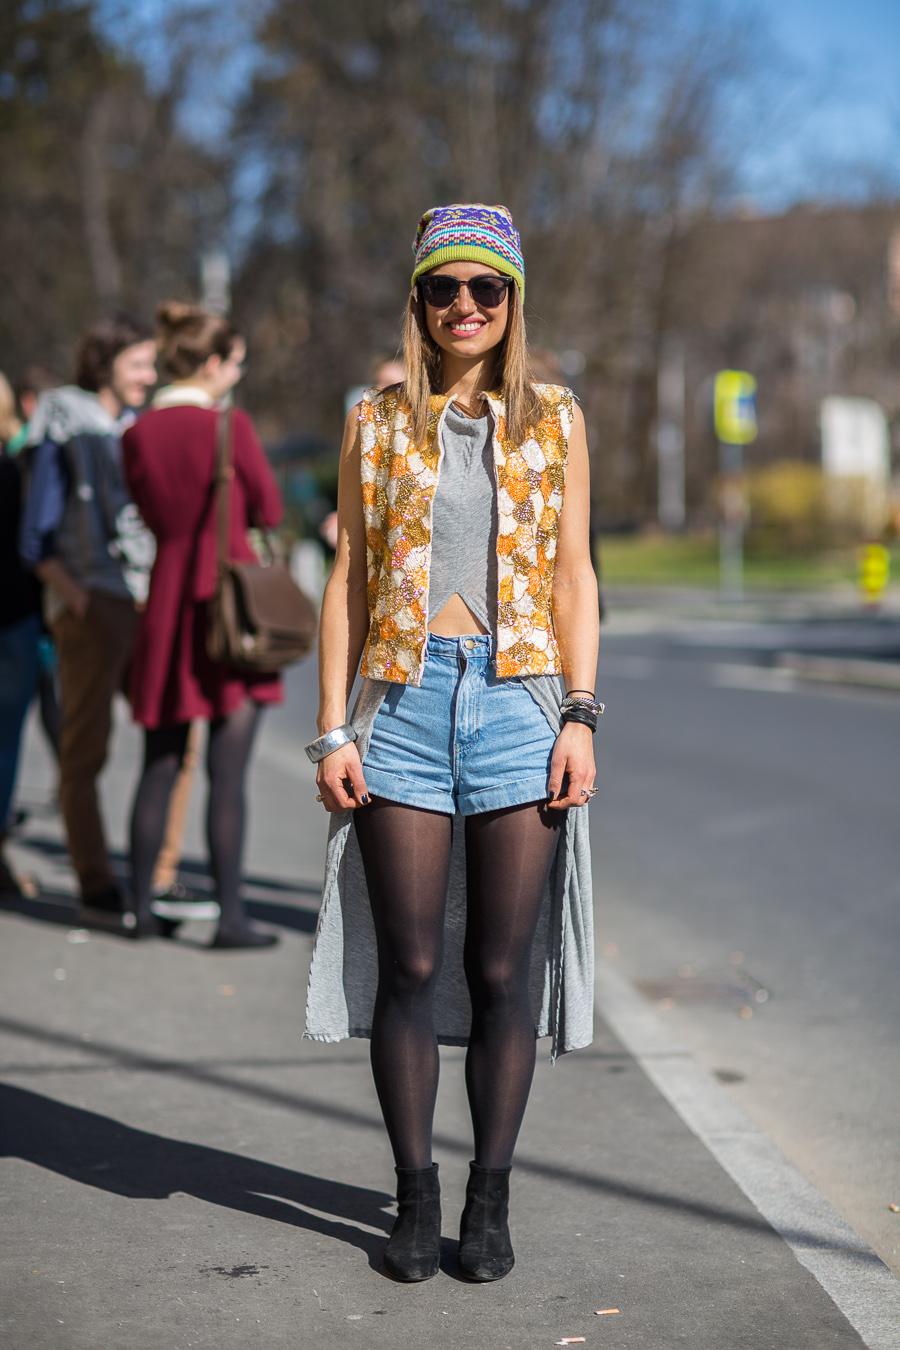 street-style-fashion-blog-innsbruck-vintage-markt-7.jpg